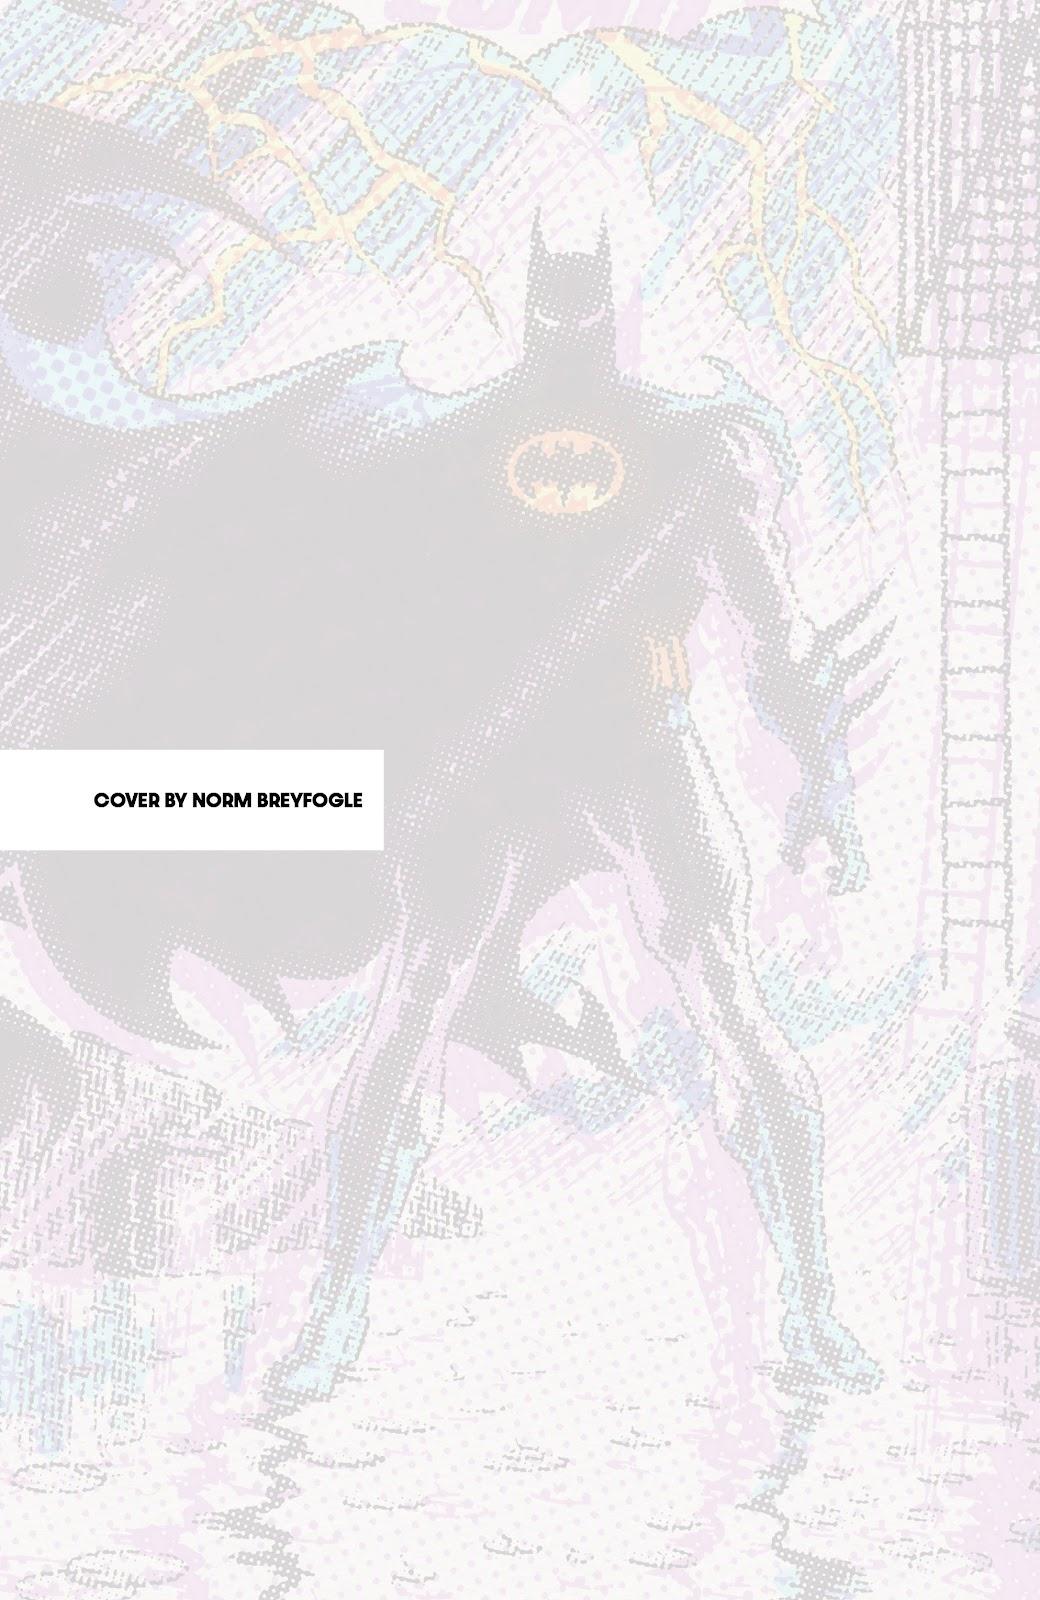 Read online Detective Comics (1937) comic -  Issue # _TPB Batman - The Dark Knight Detective 2 (Part 2) - 4